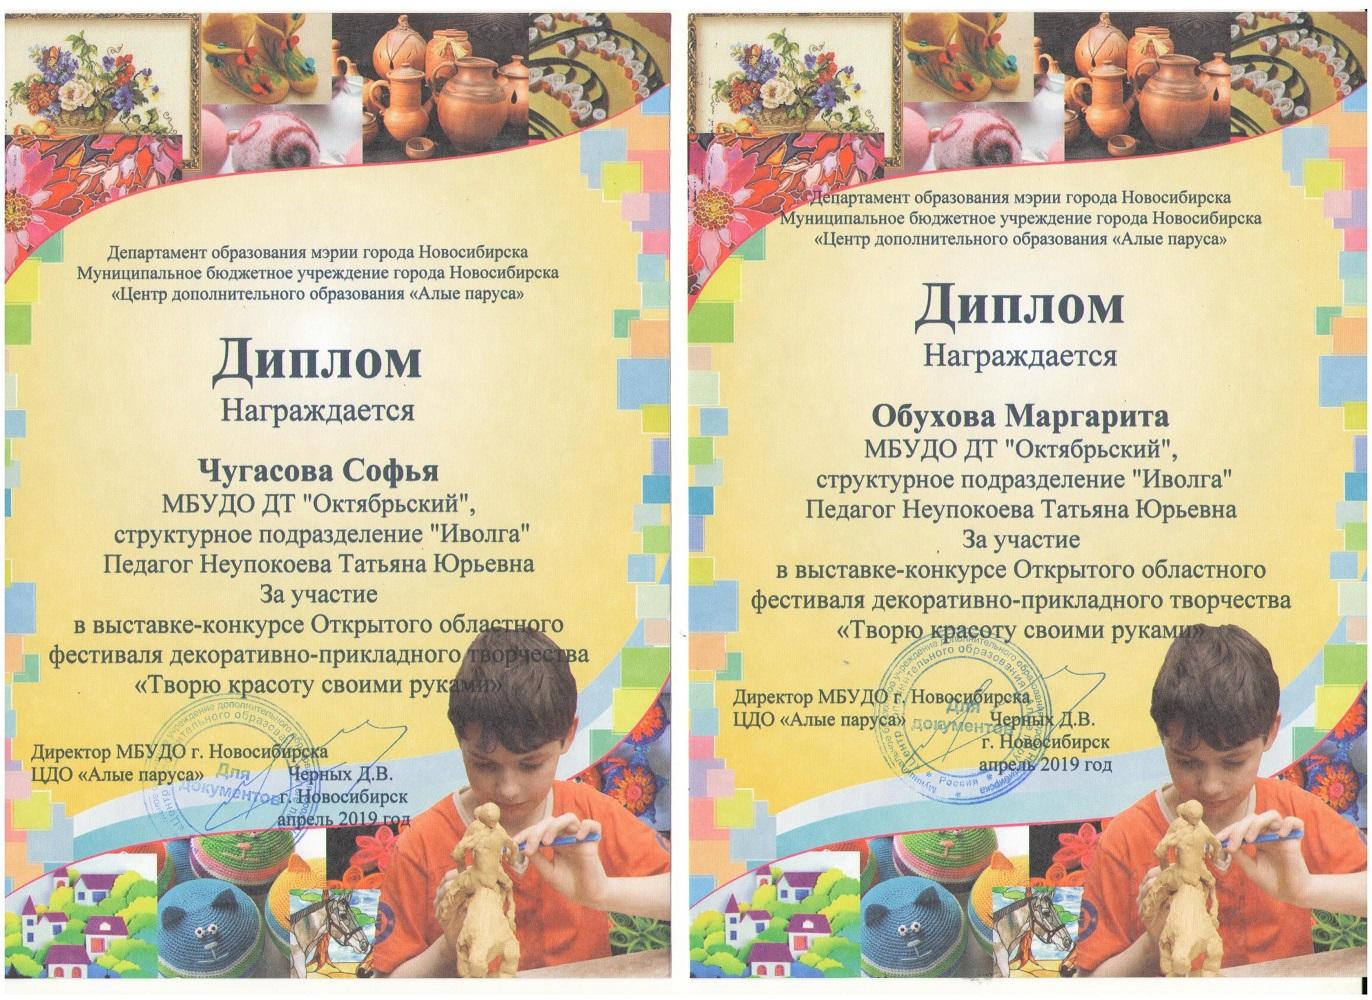 Творим-красоту_19.04.19-001